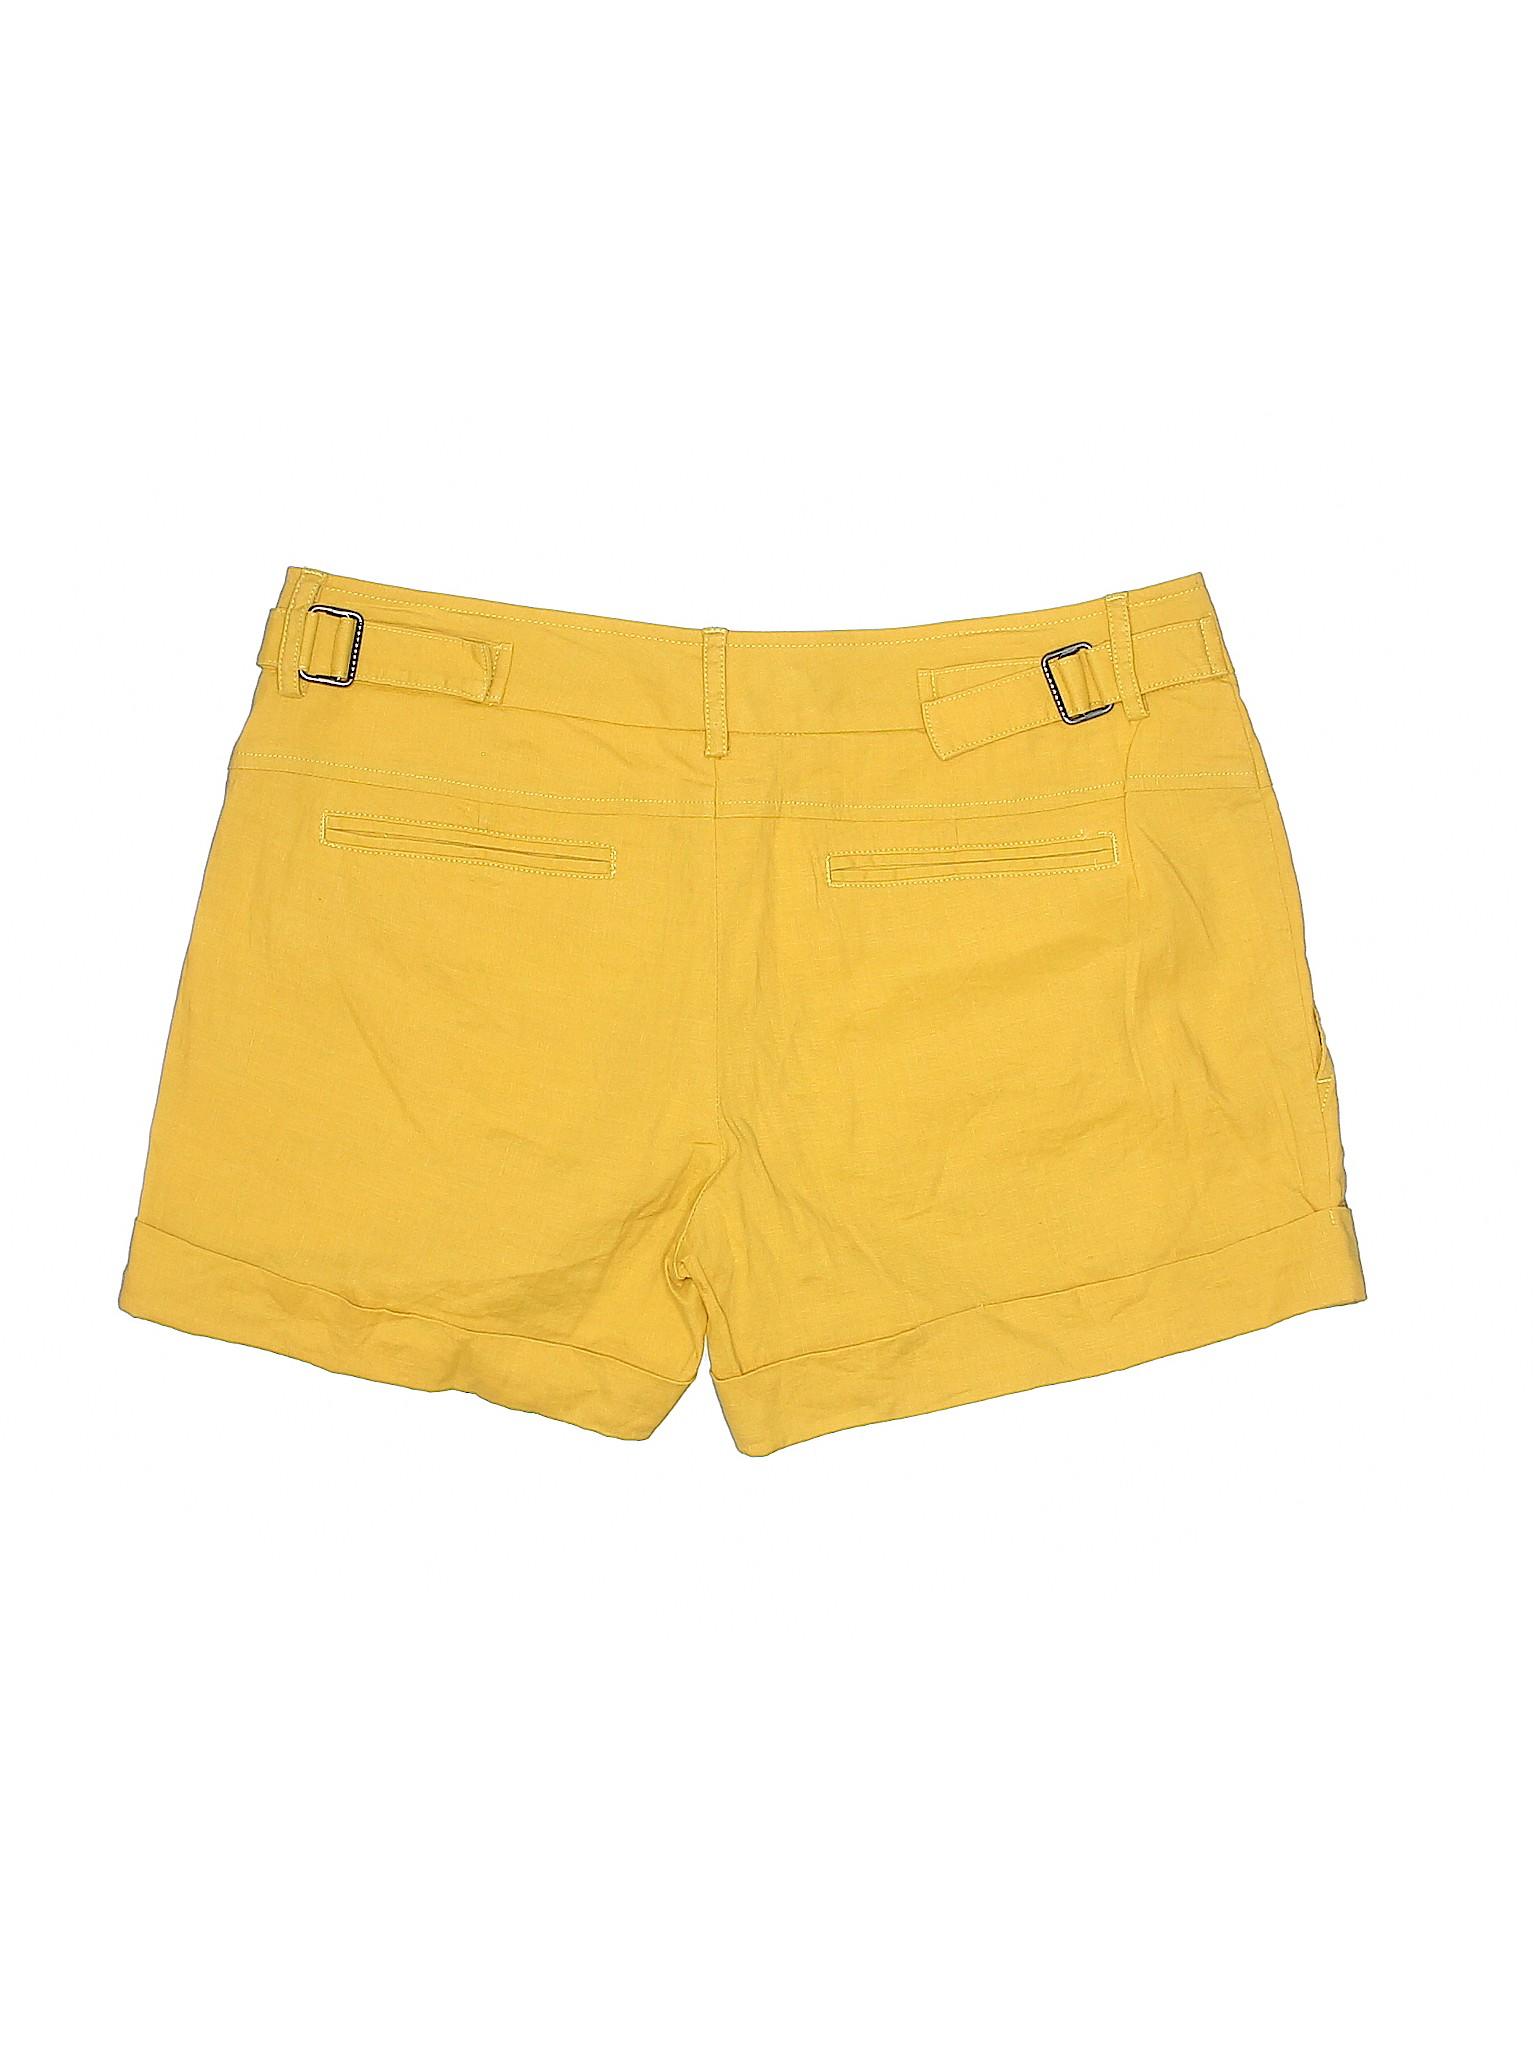 Shorts Boutique Khaki Vince Shorts Khaki Boutique Boutique winter winter Vince T55qw7z1B